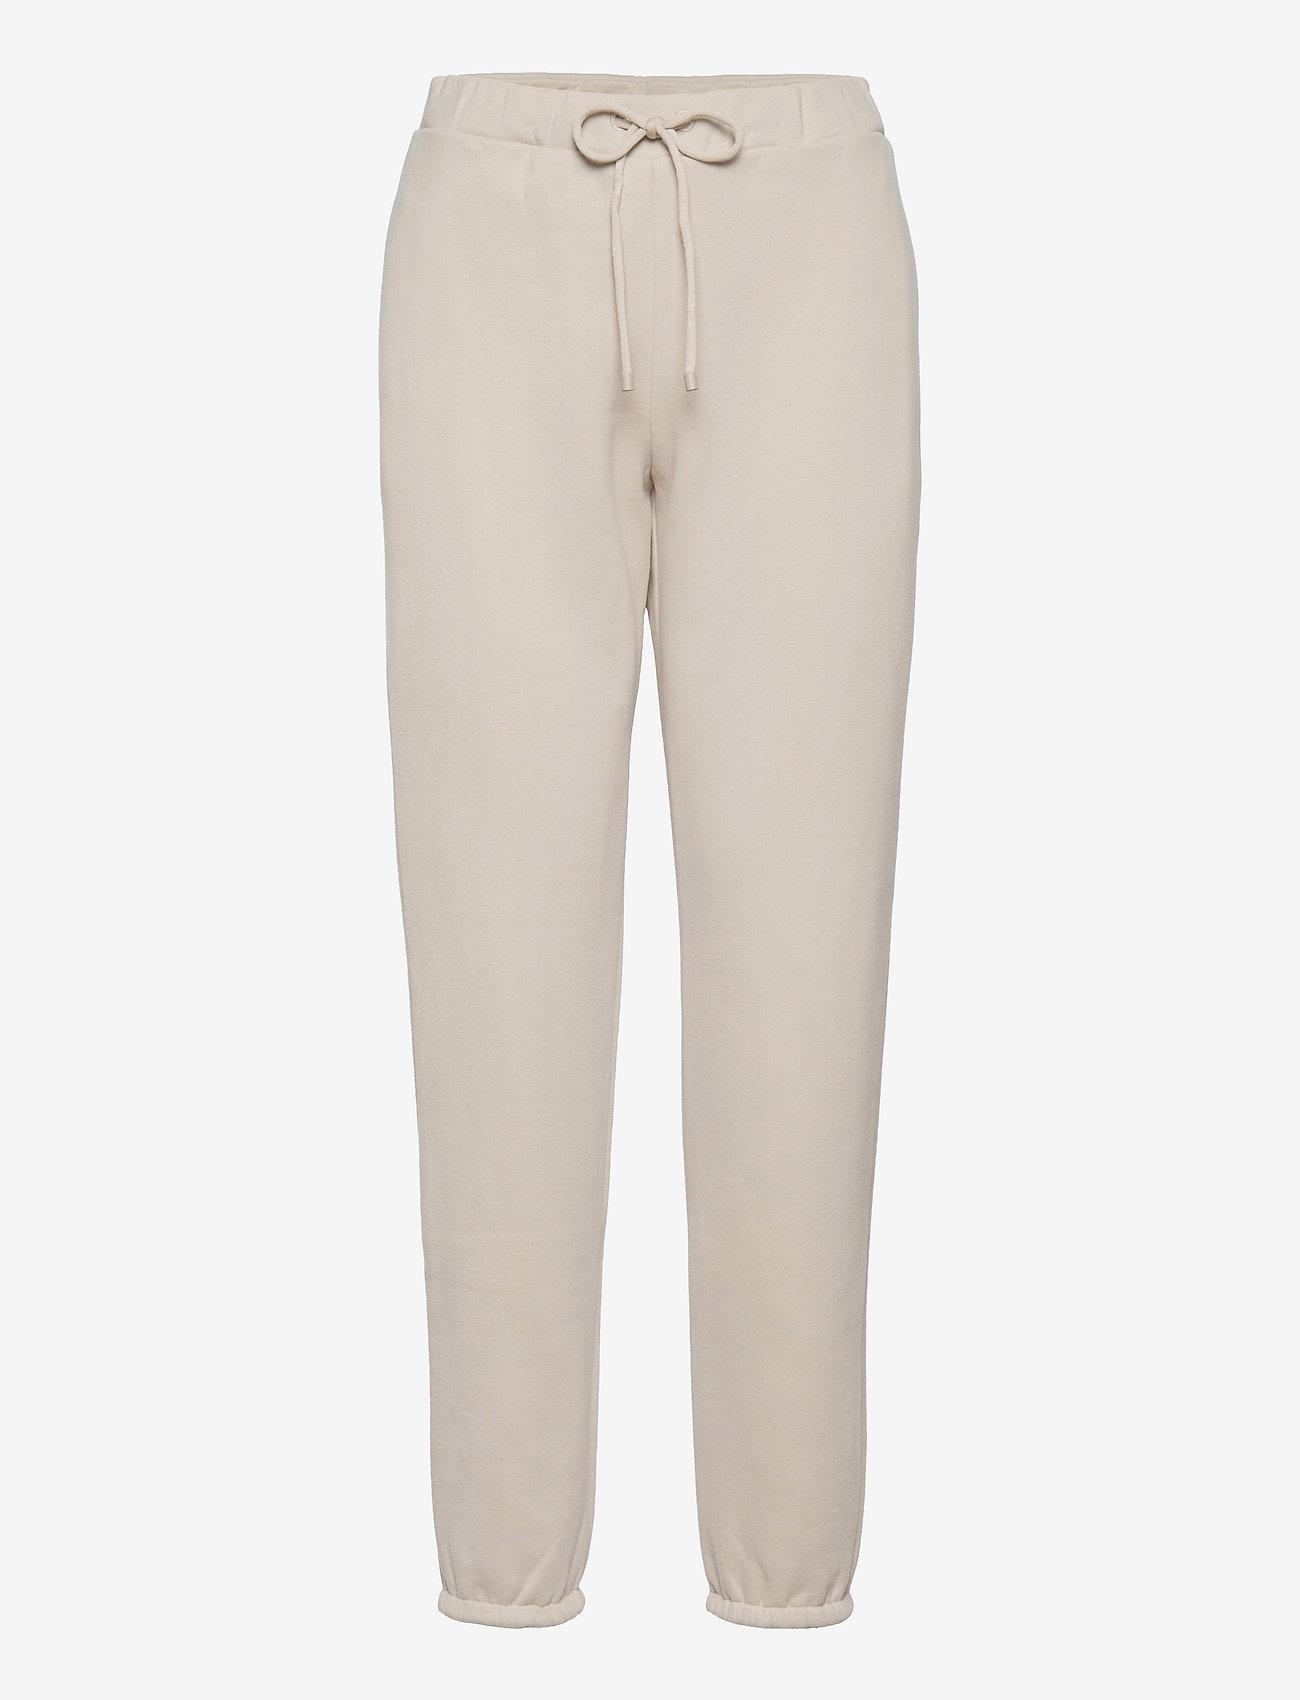 Max Mara Leisure - VISIVO - clothing - beige - 0